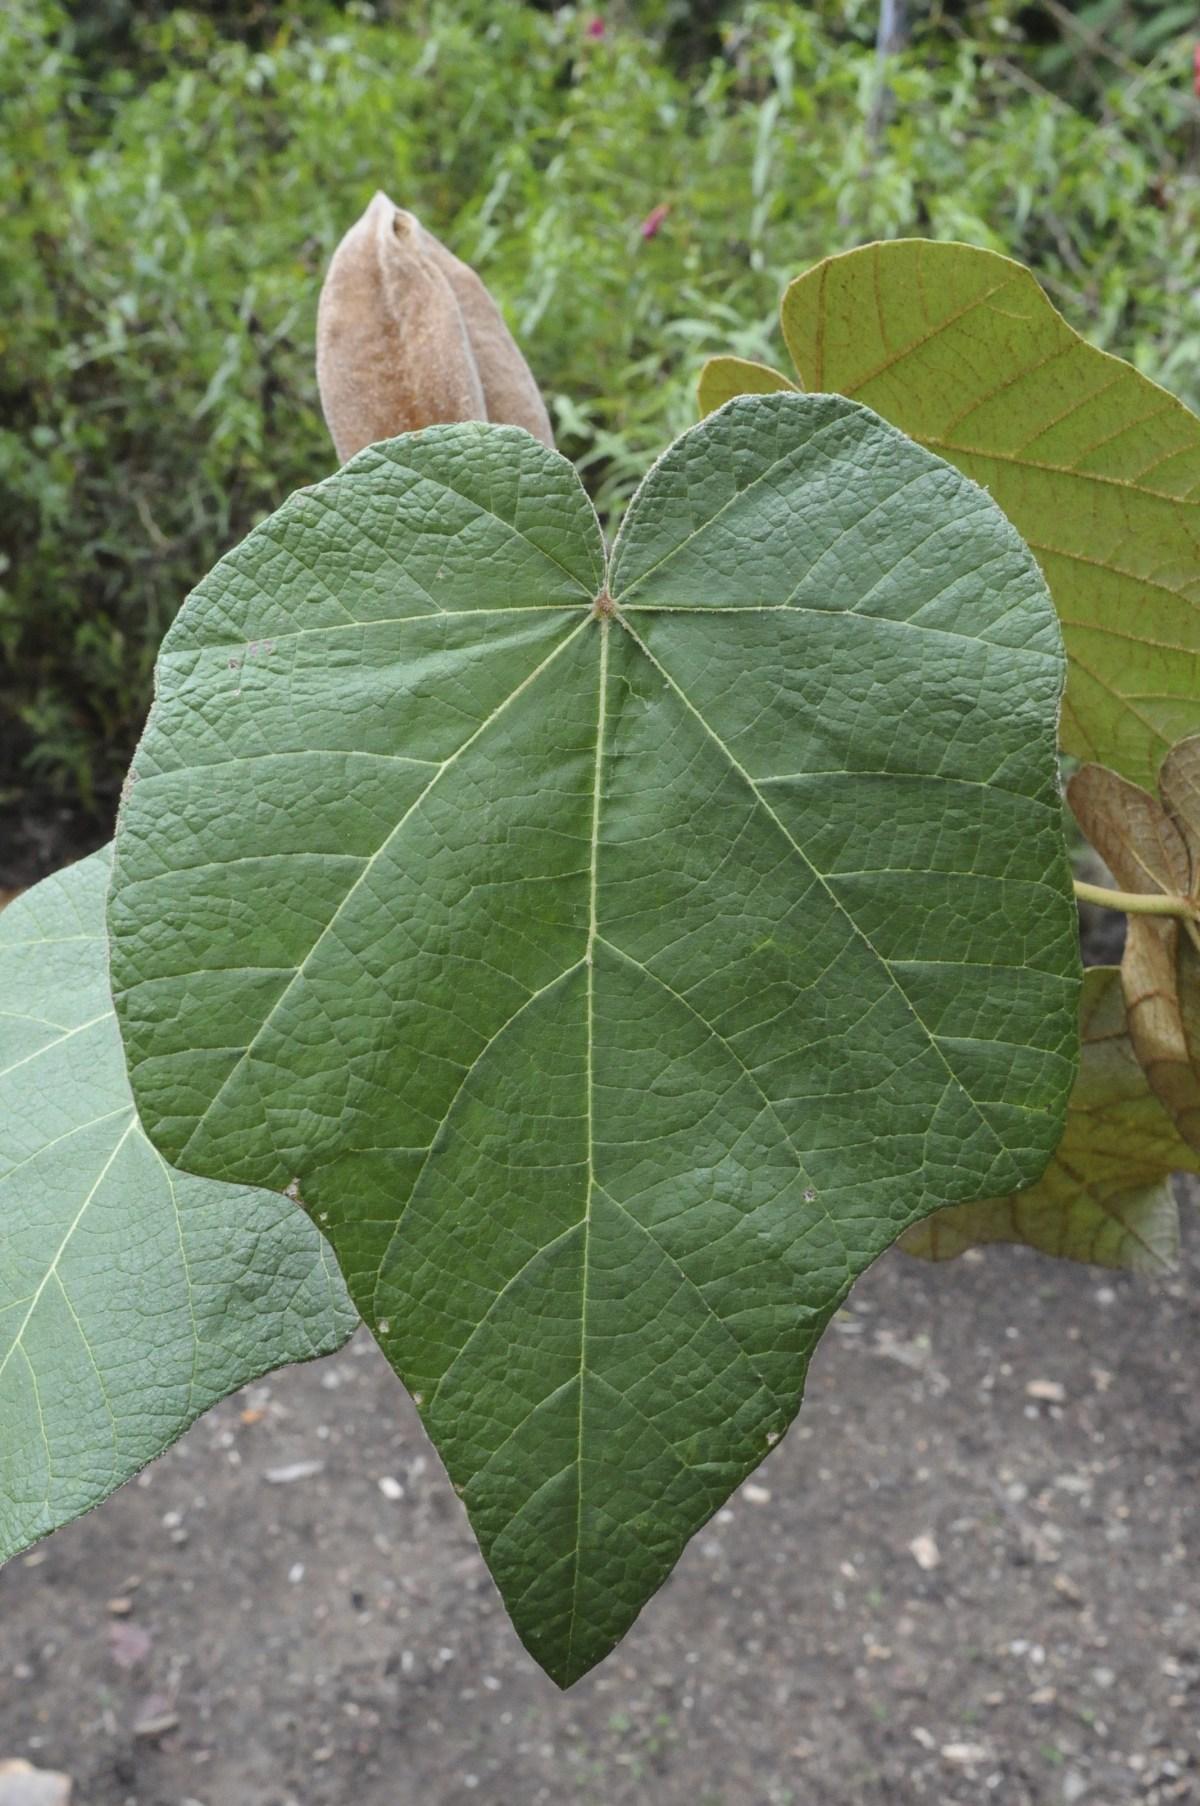 Chiranthodendron leaf.